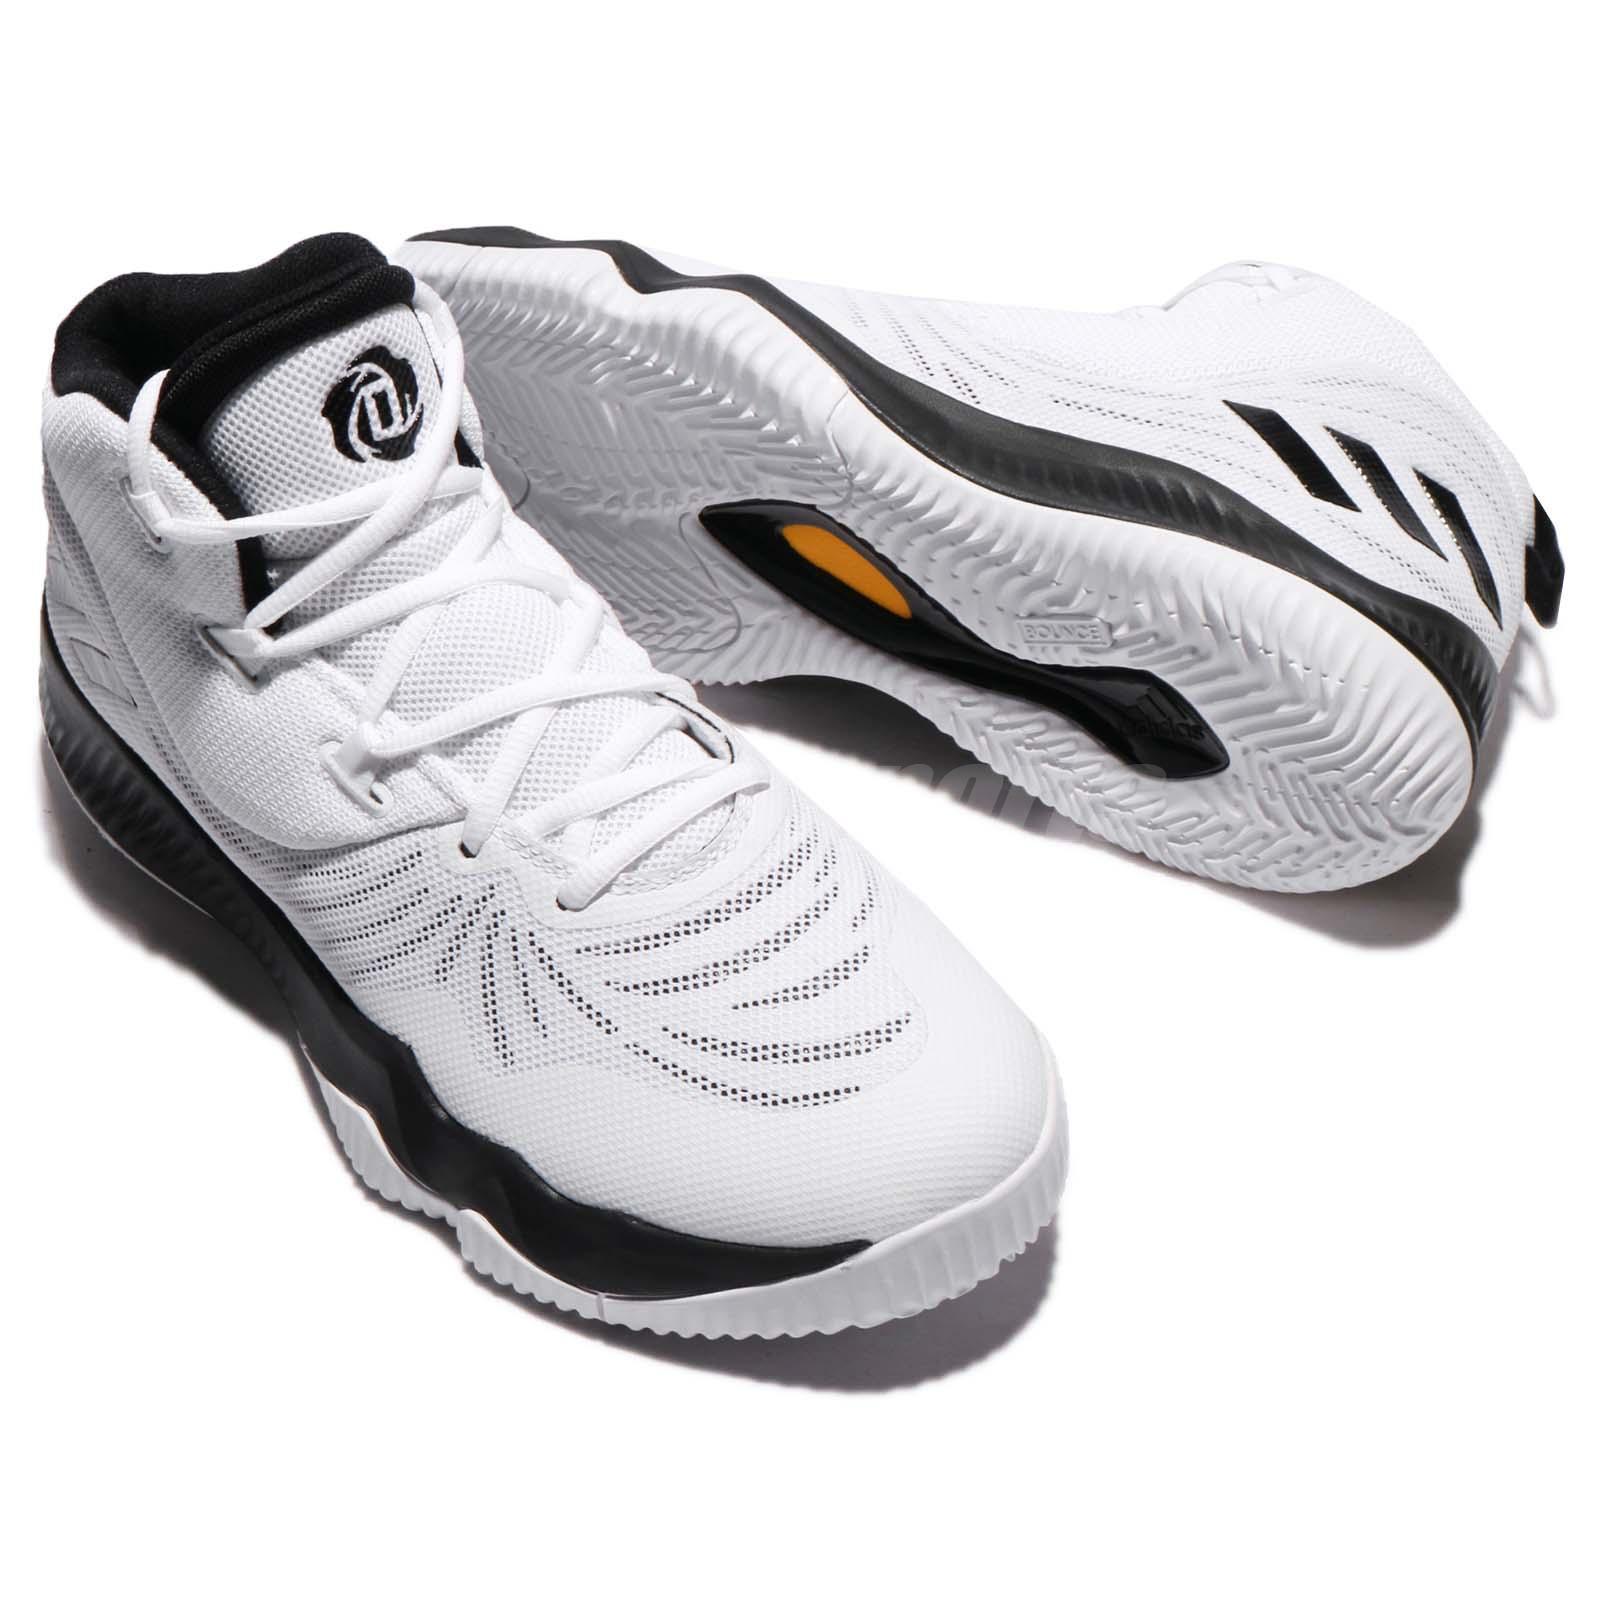 f9310c11f5535 ... 2018 outlet 9e944 683a6  adidas D Rose Dominate III 3 Derrick White  Black Men Basketb release 8f130 75c73 ...